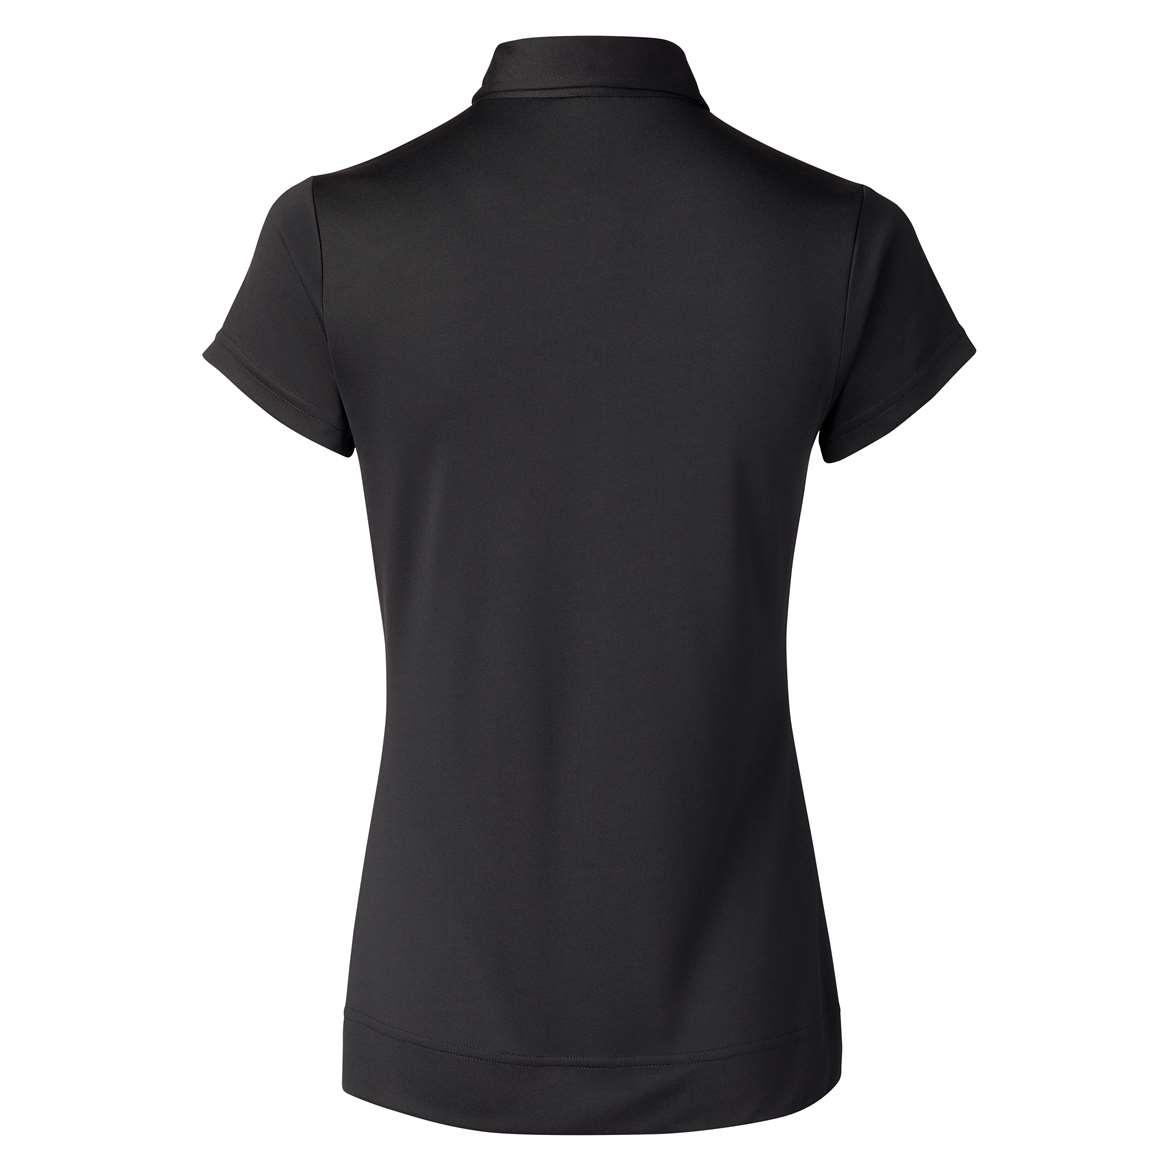 Daily Sports Damen Kayla Poloshirt 143/146 schwarz